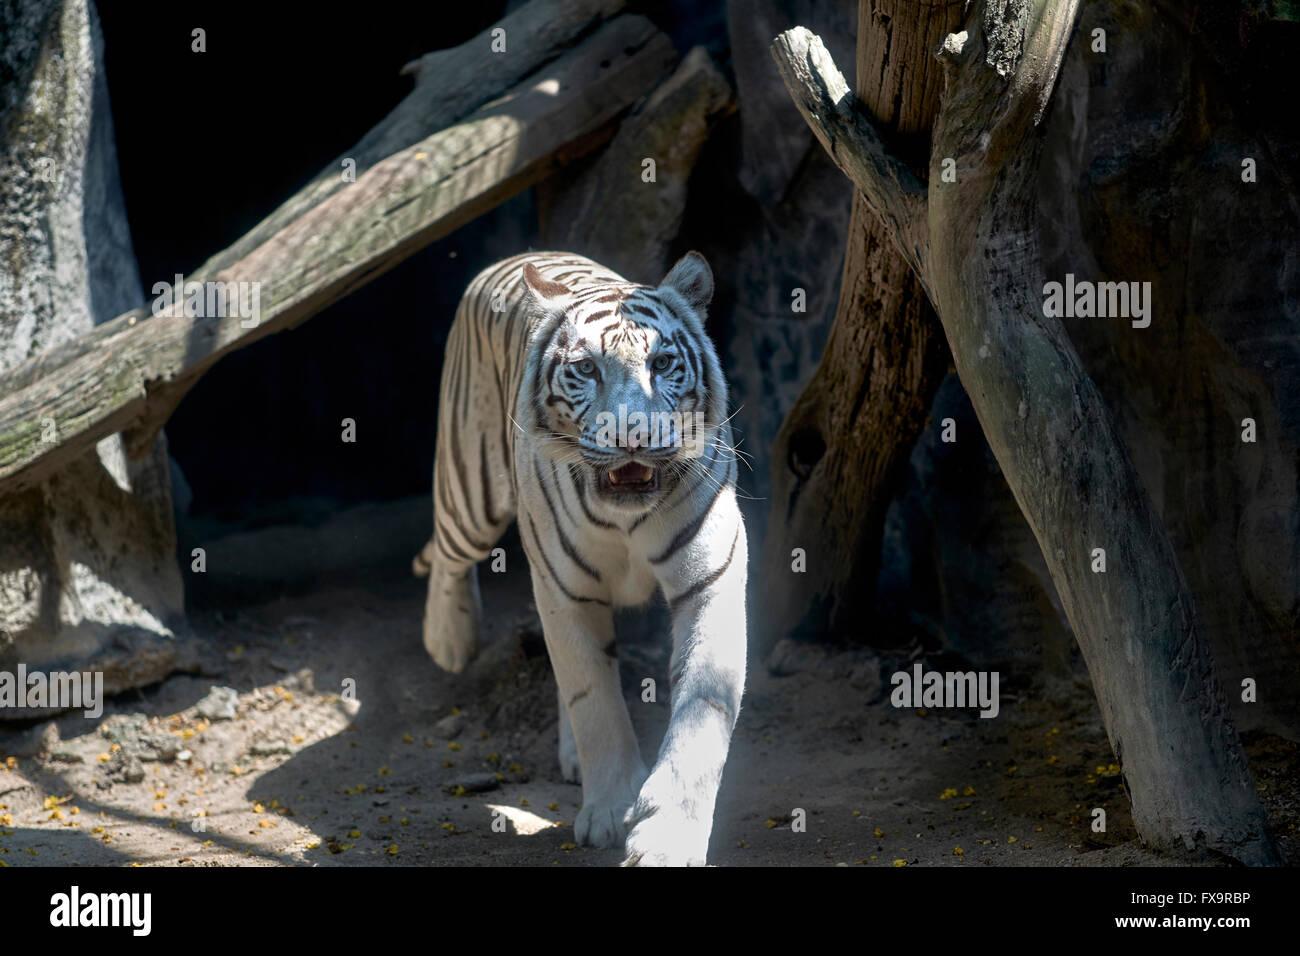 White Tiger Khao Kheow Open Zoo Si Racha Nr Pattaya Thailand S. E. Asia - Stock Image